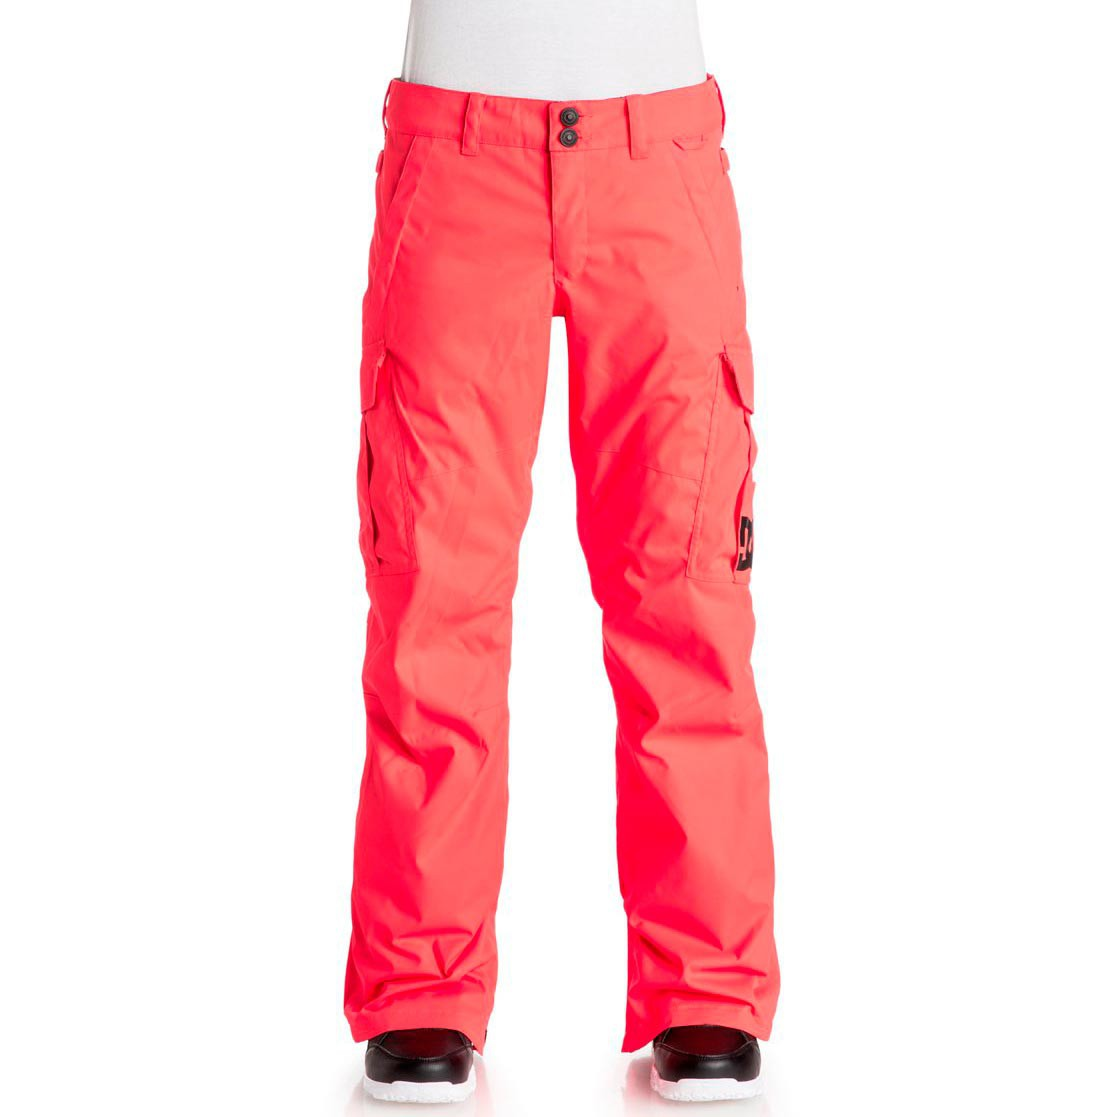 Kalhoty DC Ace fiery coral